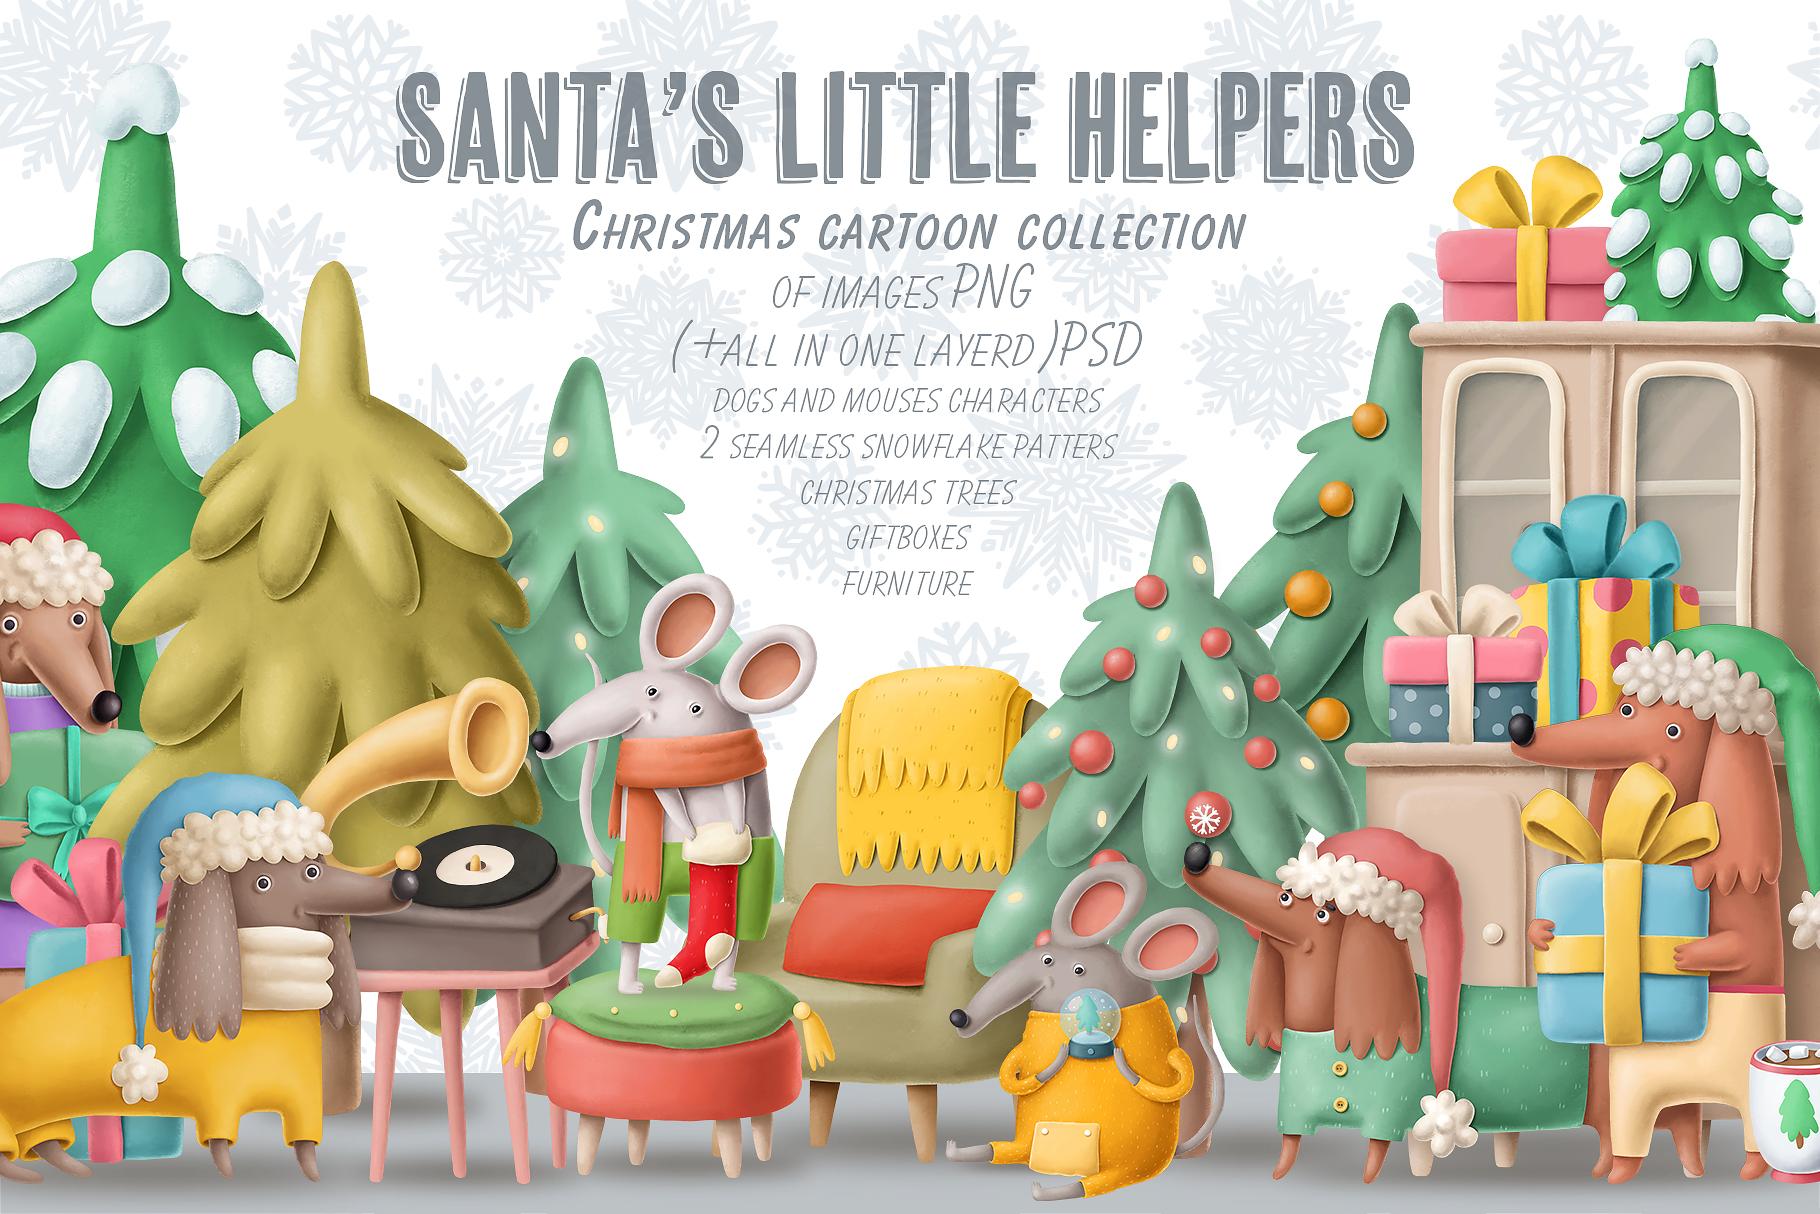 Santa's little helpers example image 1